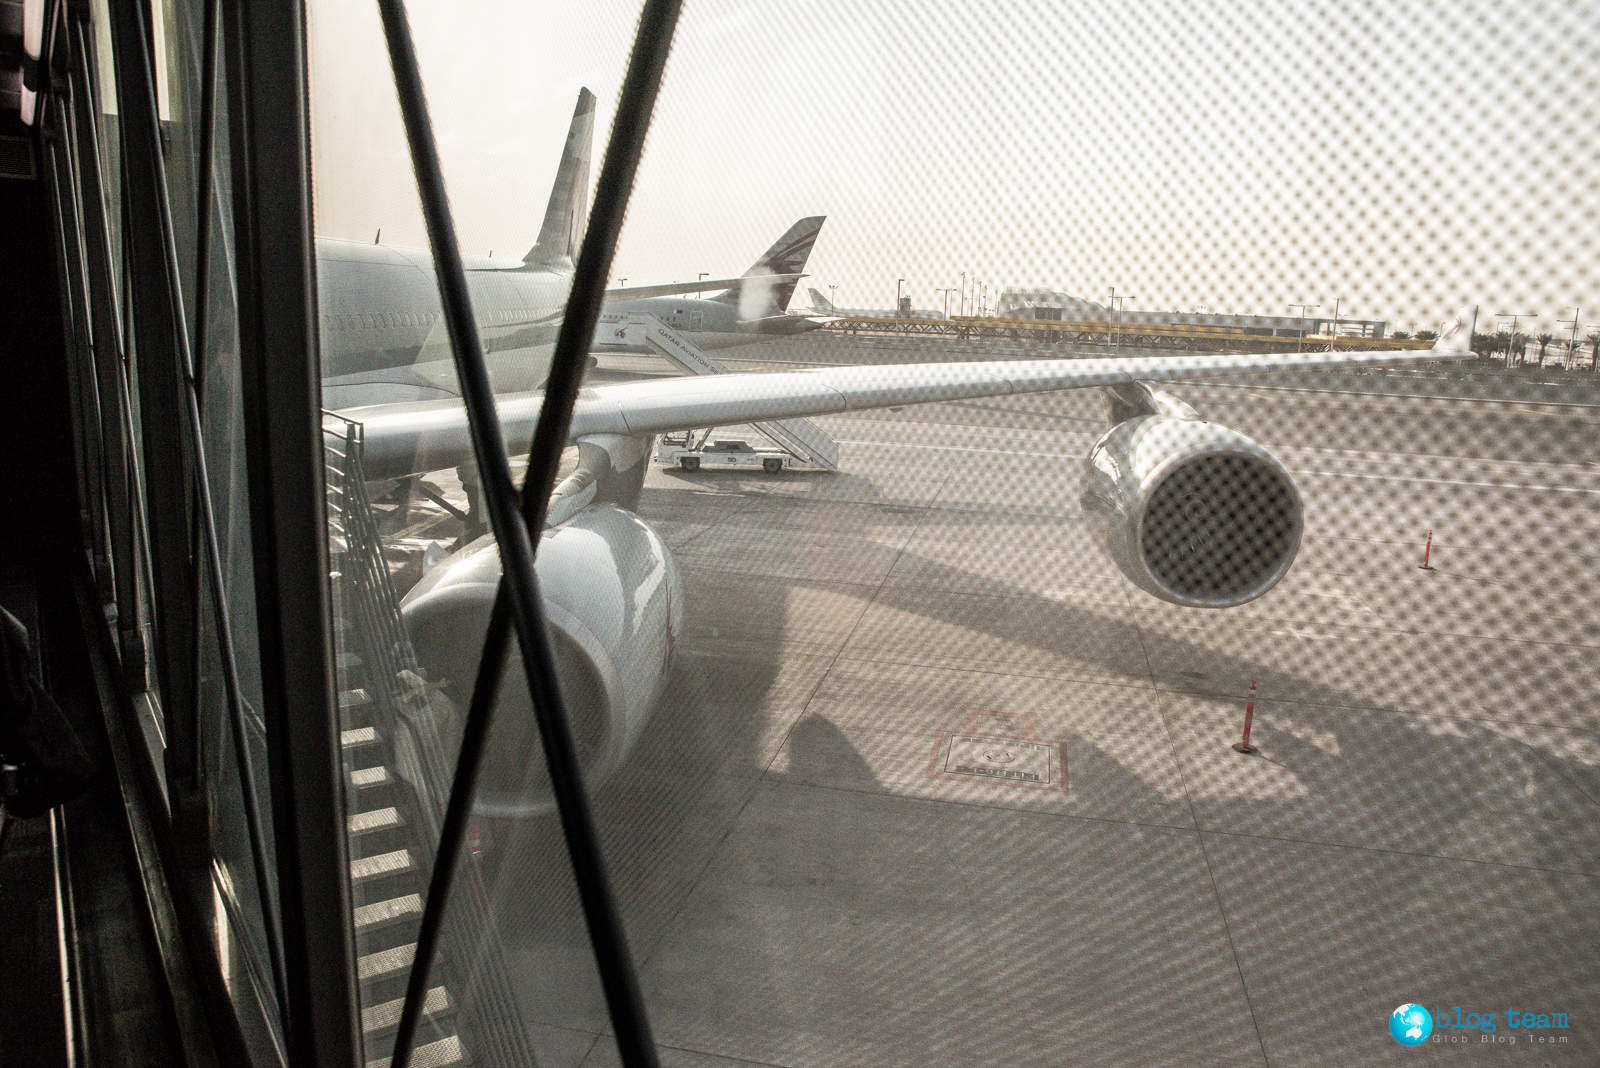 Qatar - Airbus A340 to Sri Lanka (Colombo)